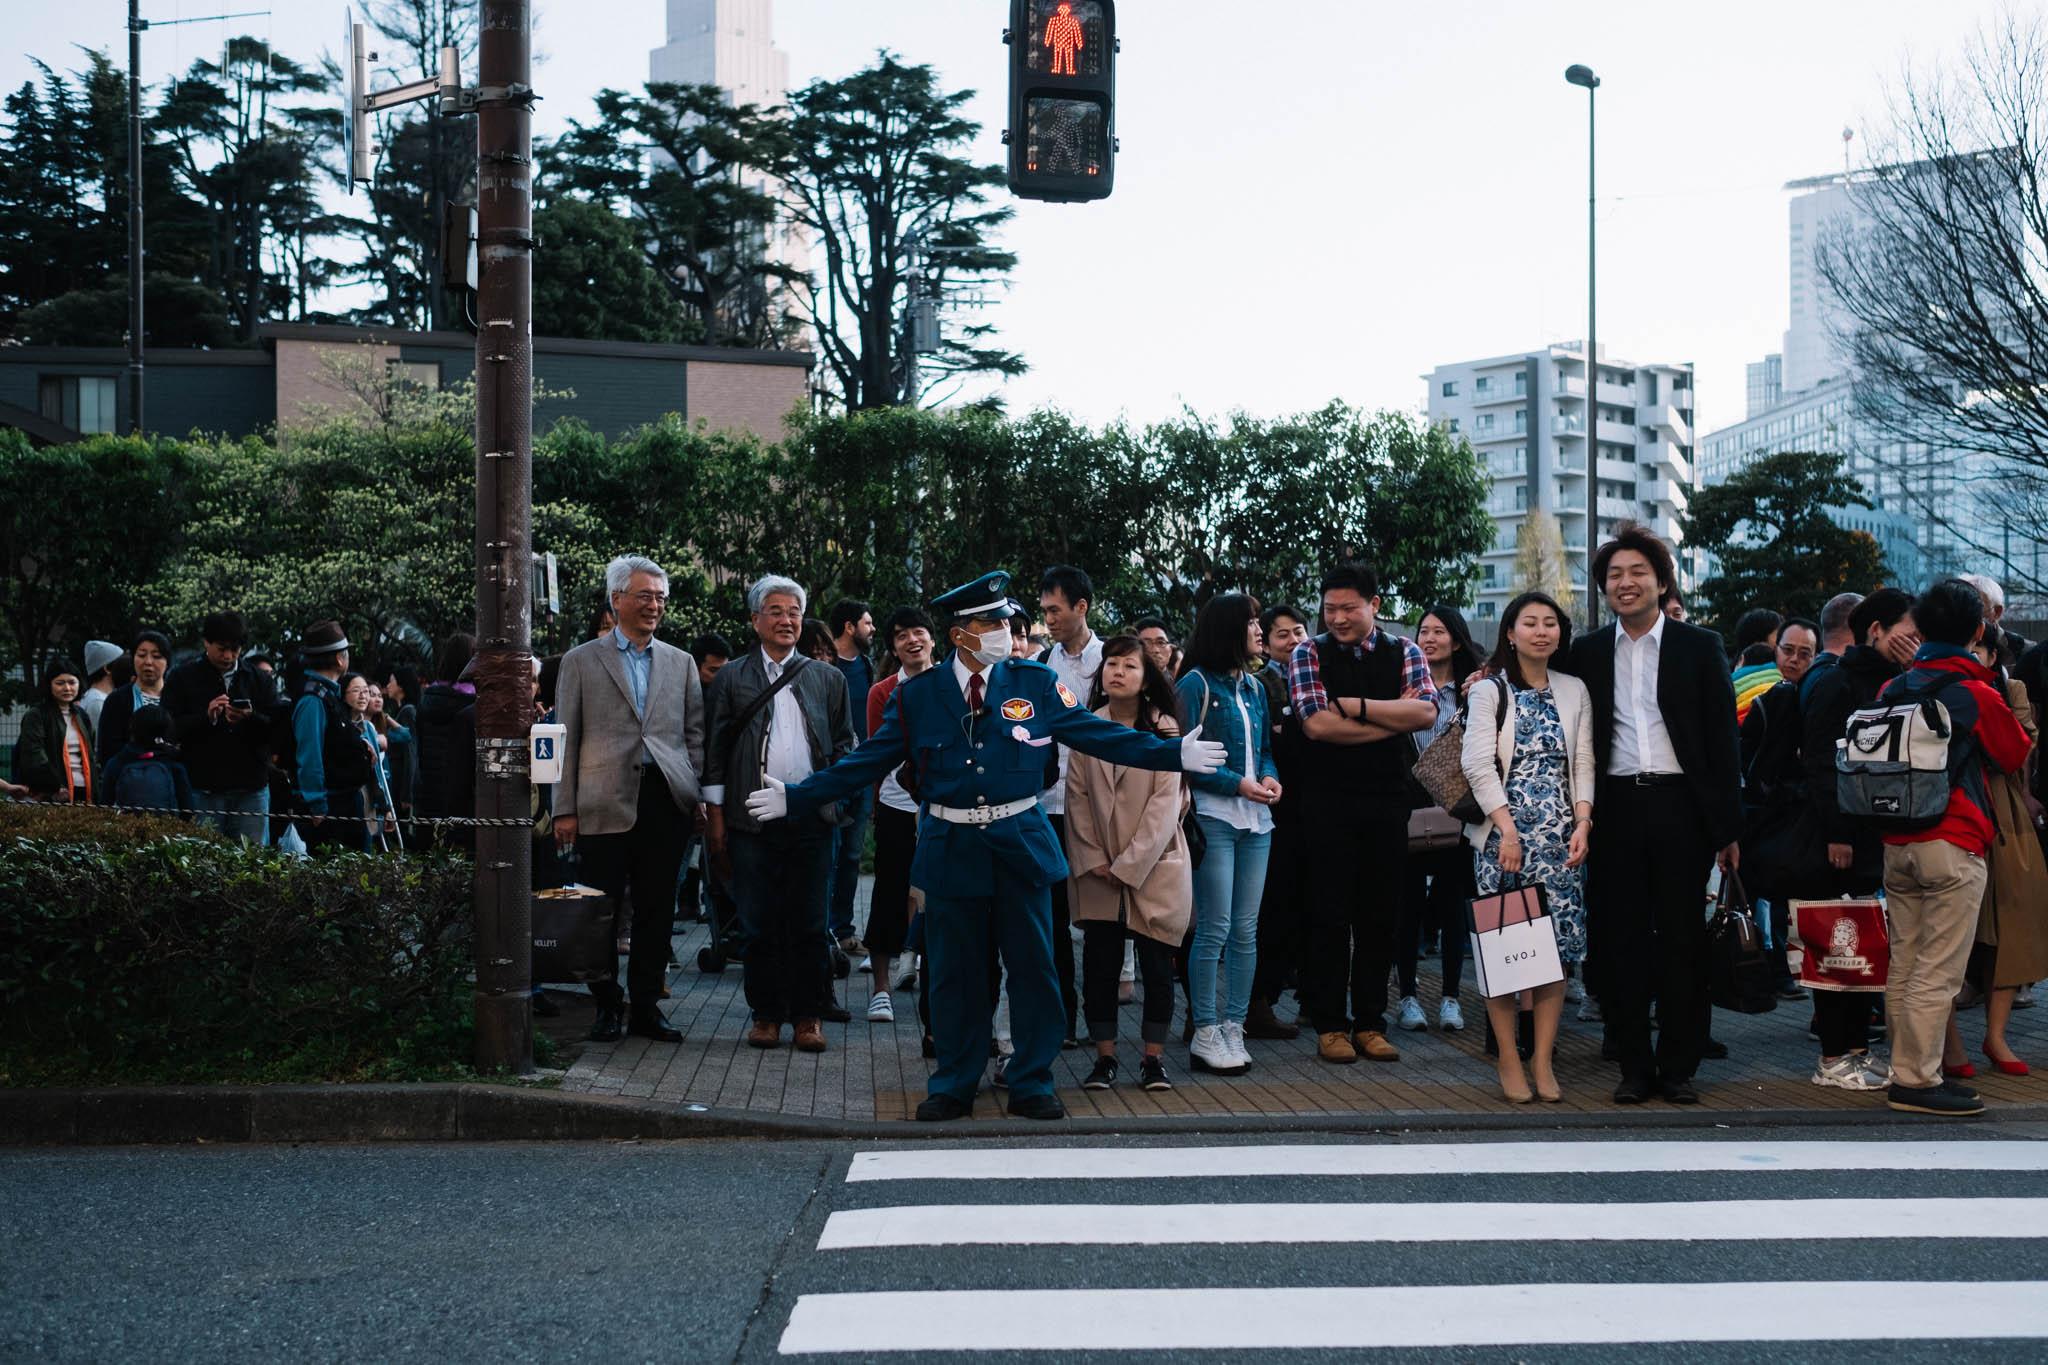 chris_eberhardt_japan_travel_reise_nippon-76.jpg